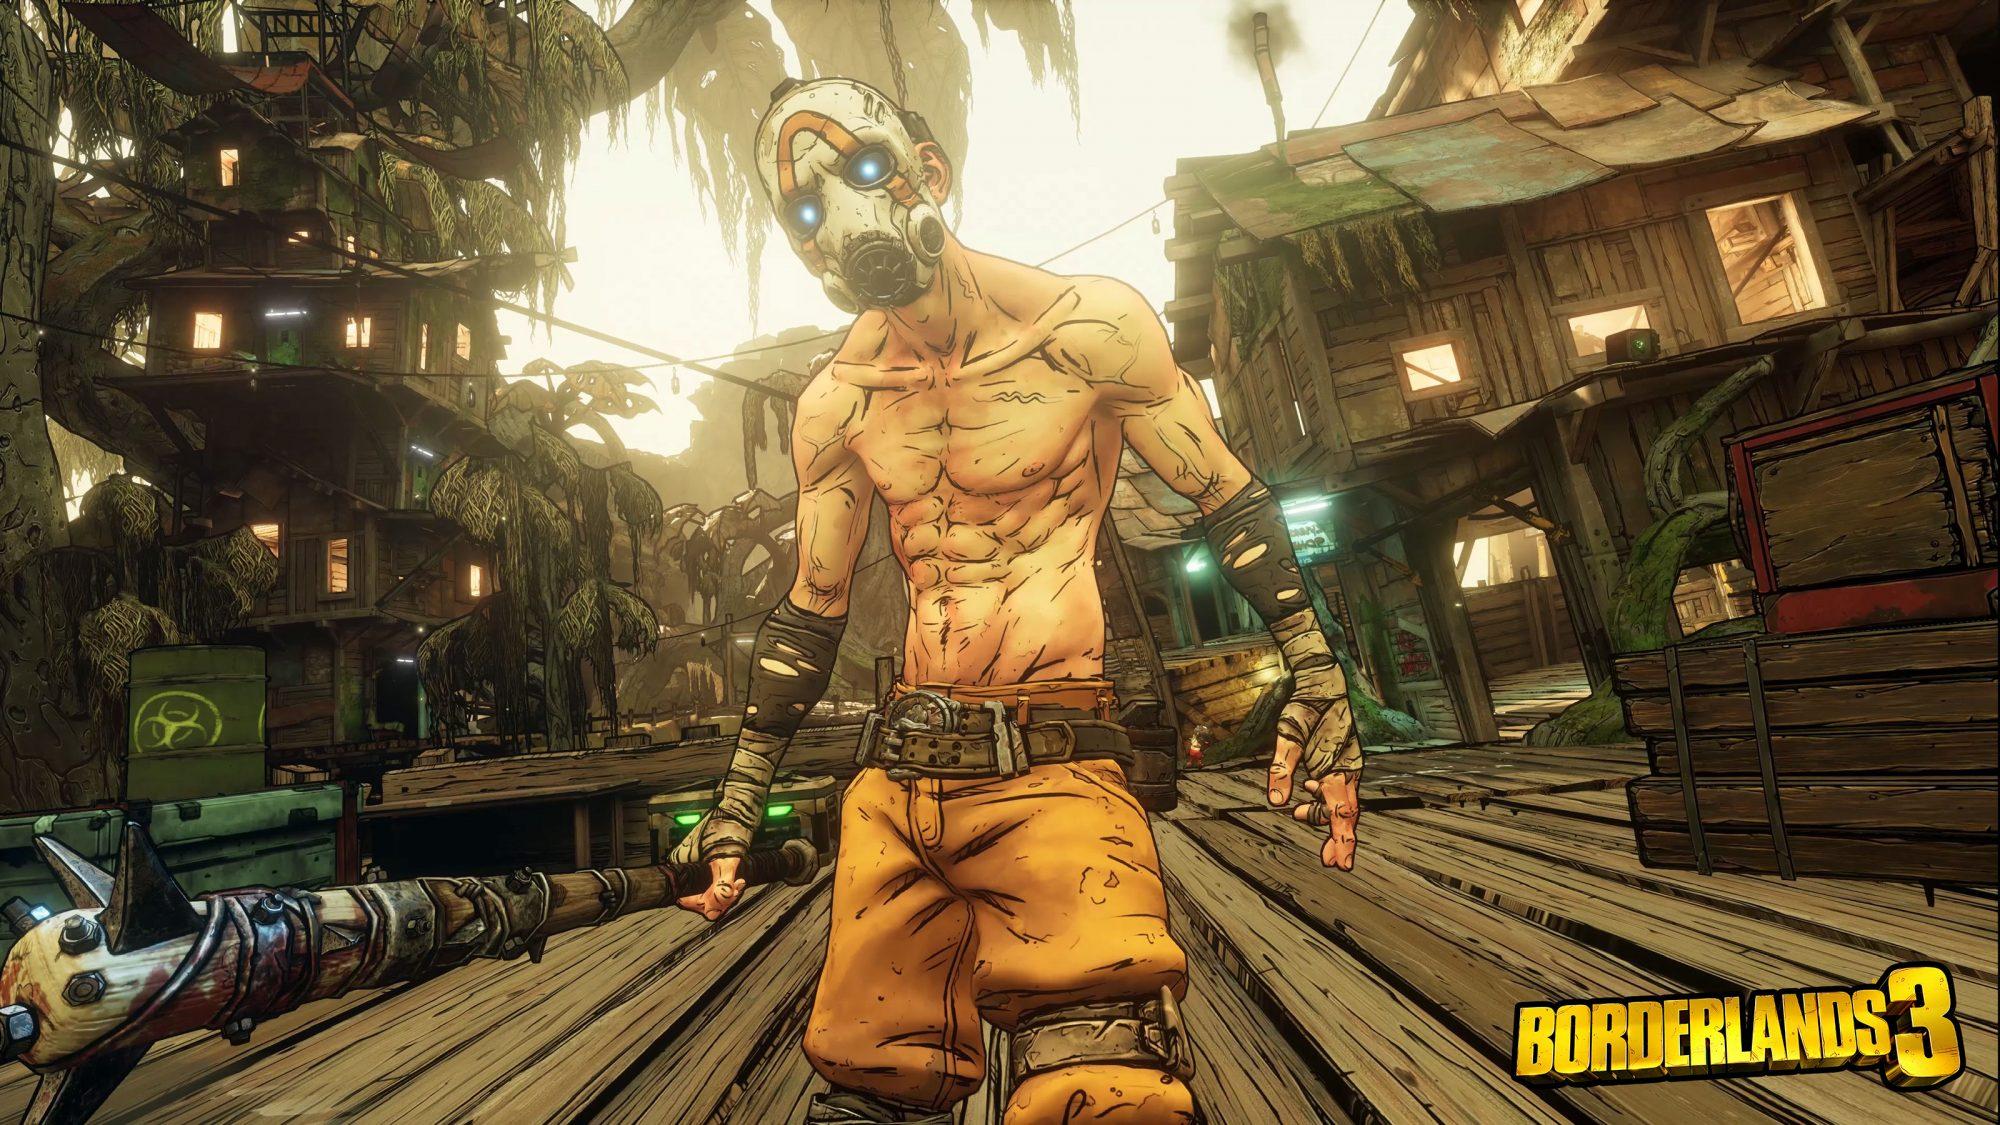 Borderlands 3 CR: Gearbox Software/2K Games